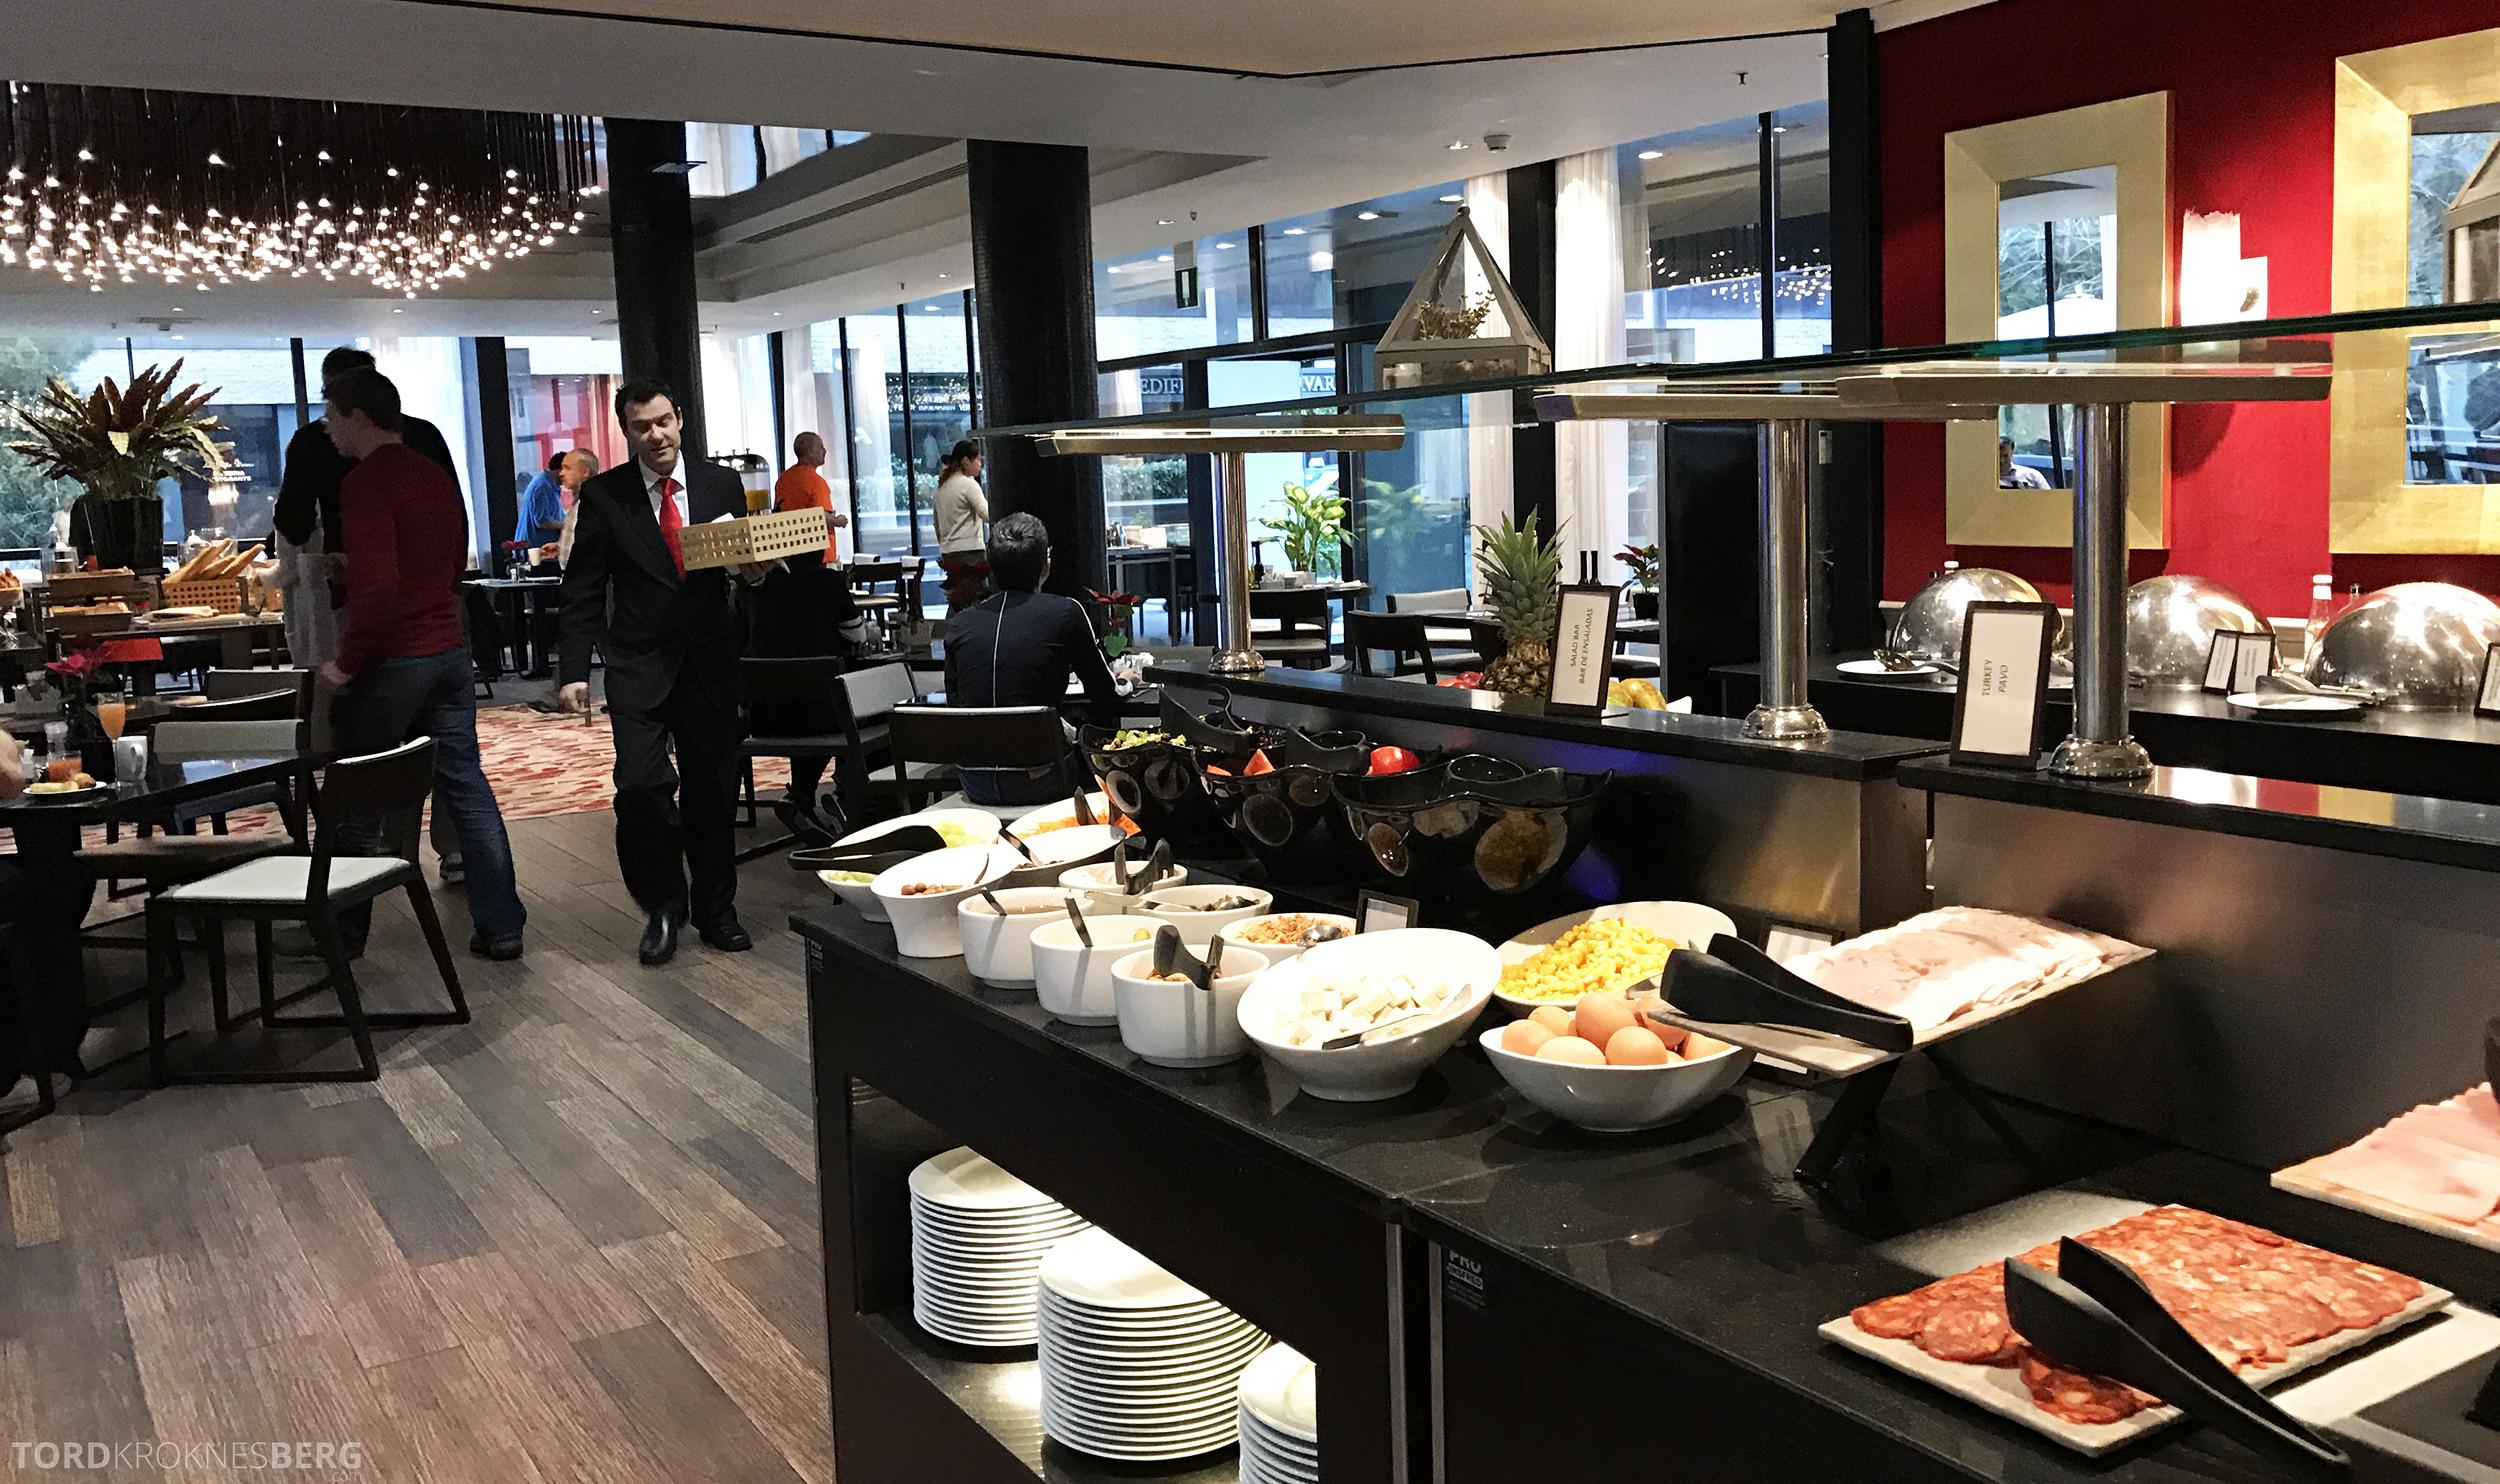 Hilton Barcelona frokostbuffet